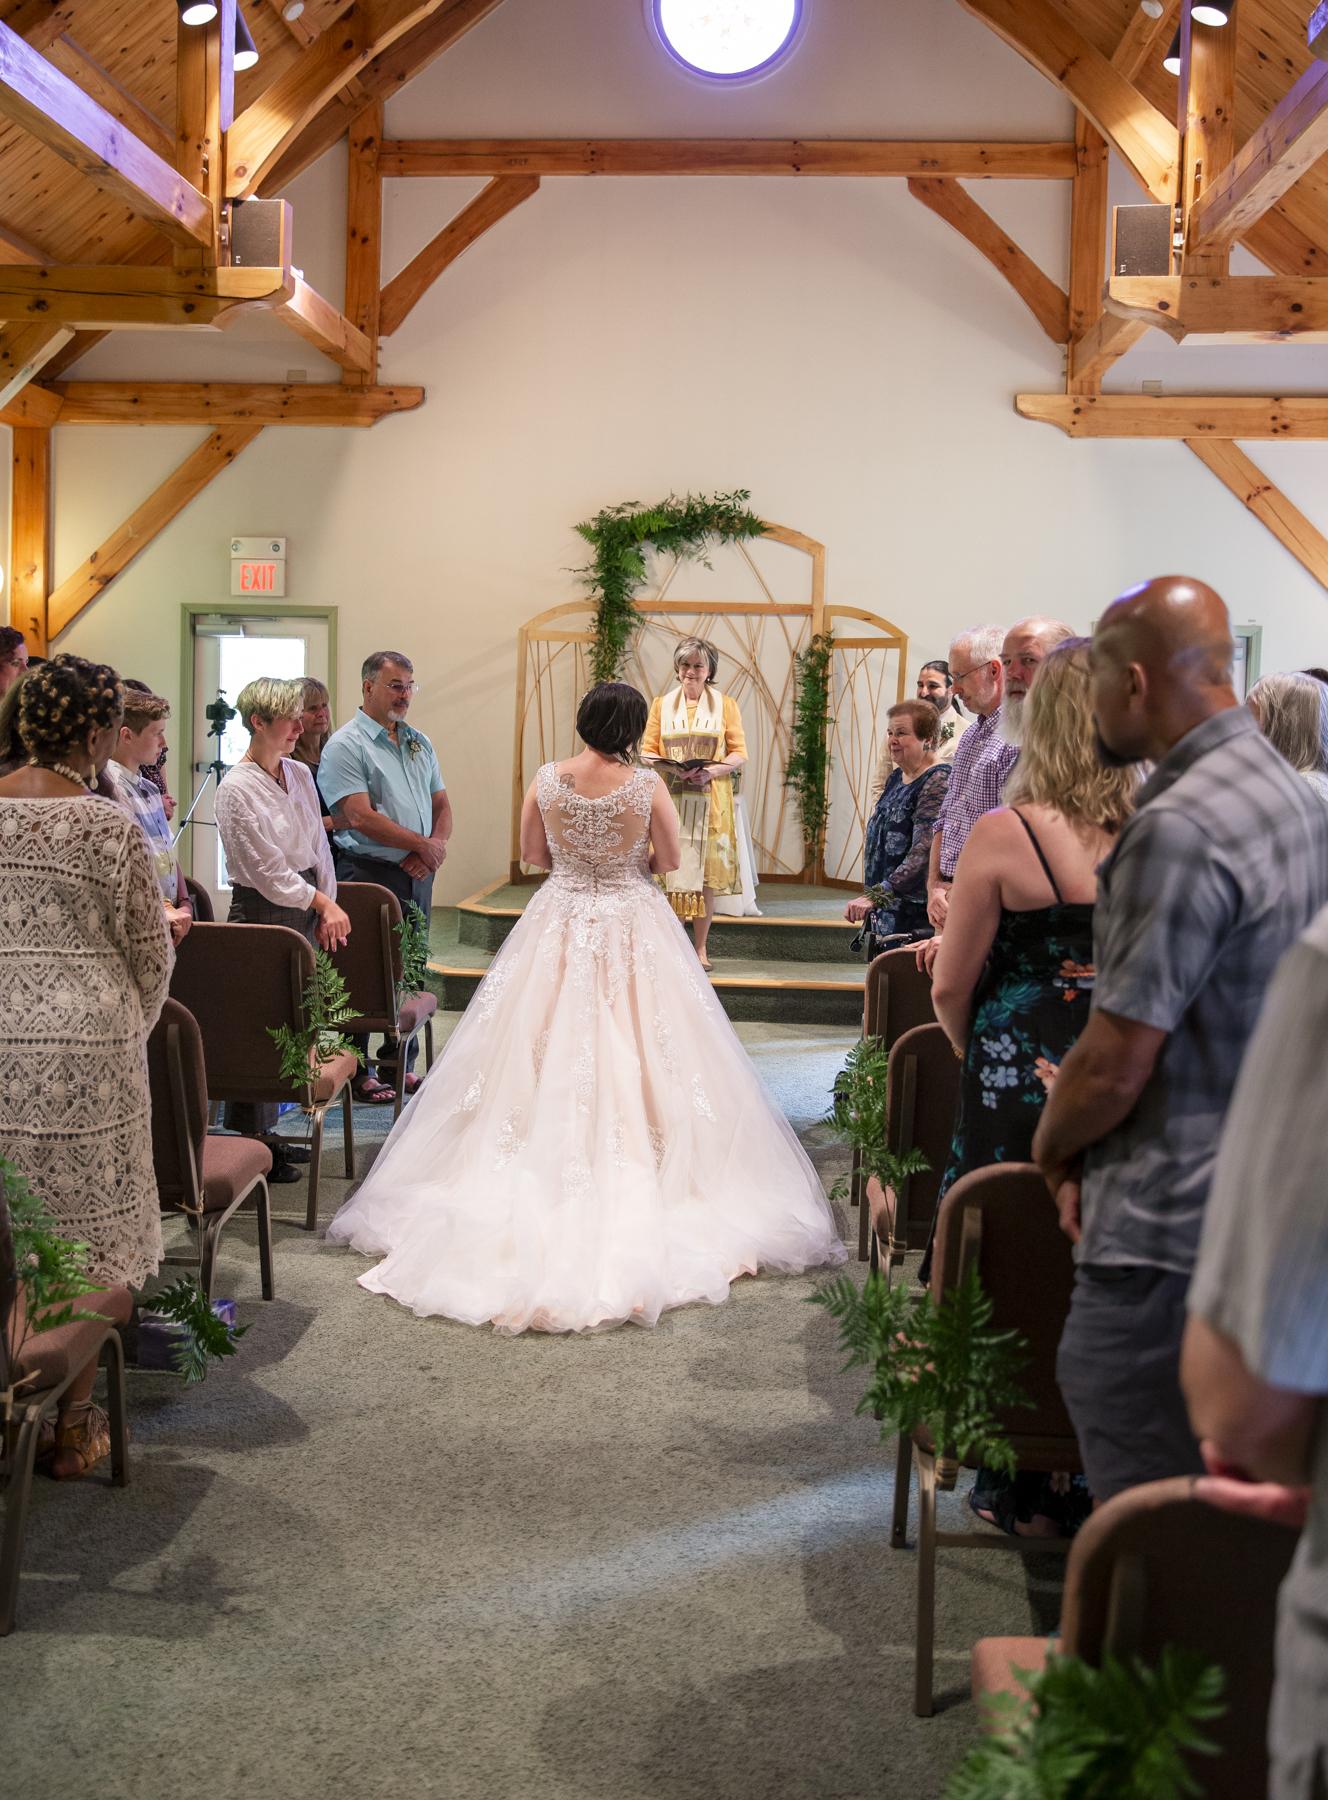 Avyanna and Phoenix Wedding- Photos by Studio Misha_BLOG-55.jpg